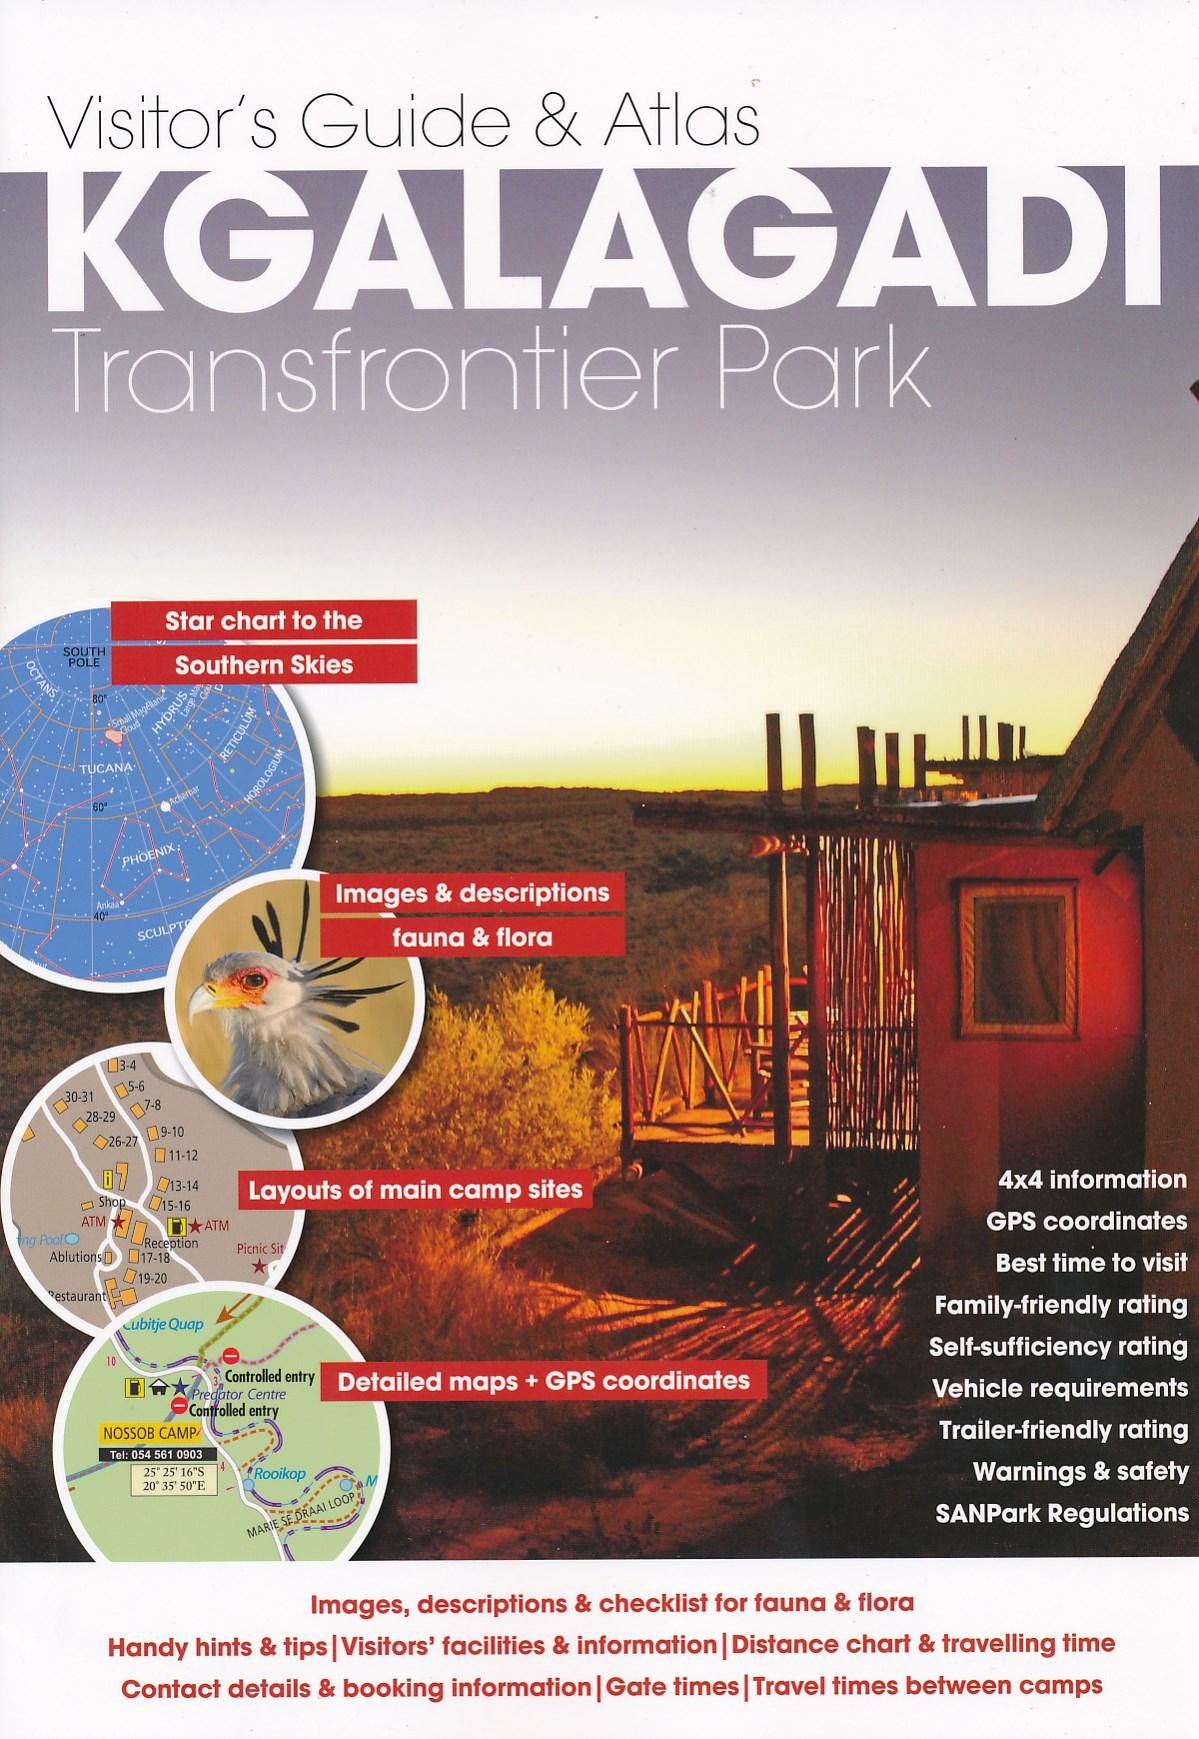 Wegenatlas - Reisgids Visitor's Guide to Kgalagadi Transfrontier Park   MapStudio